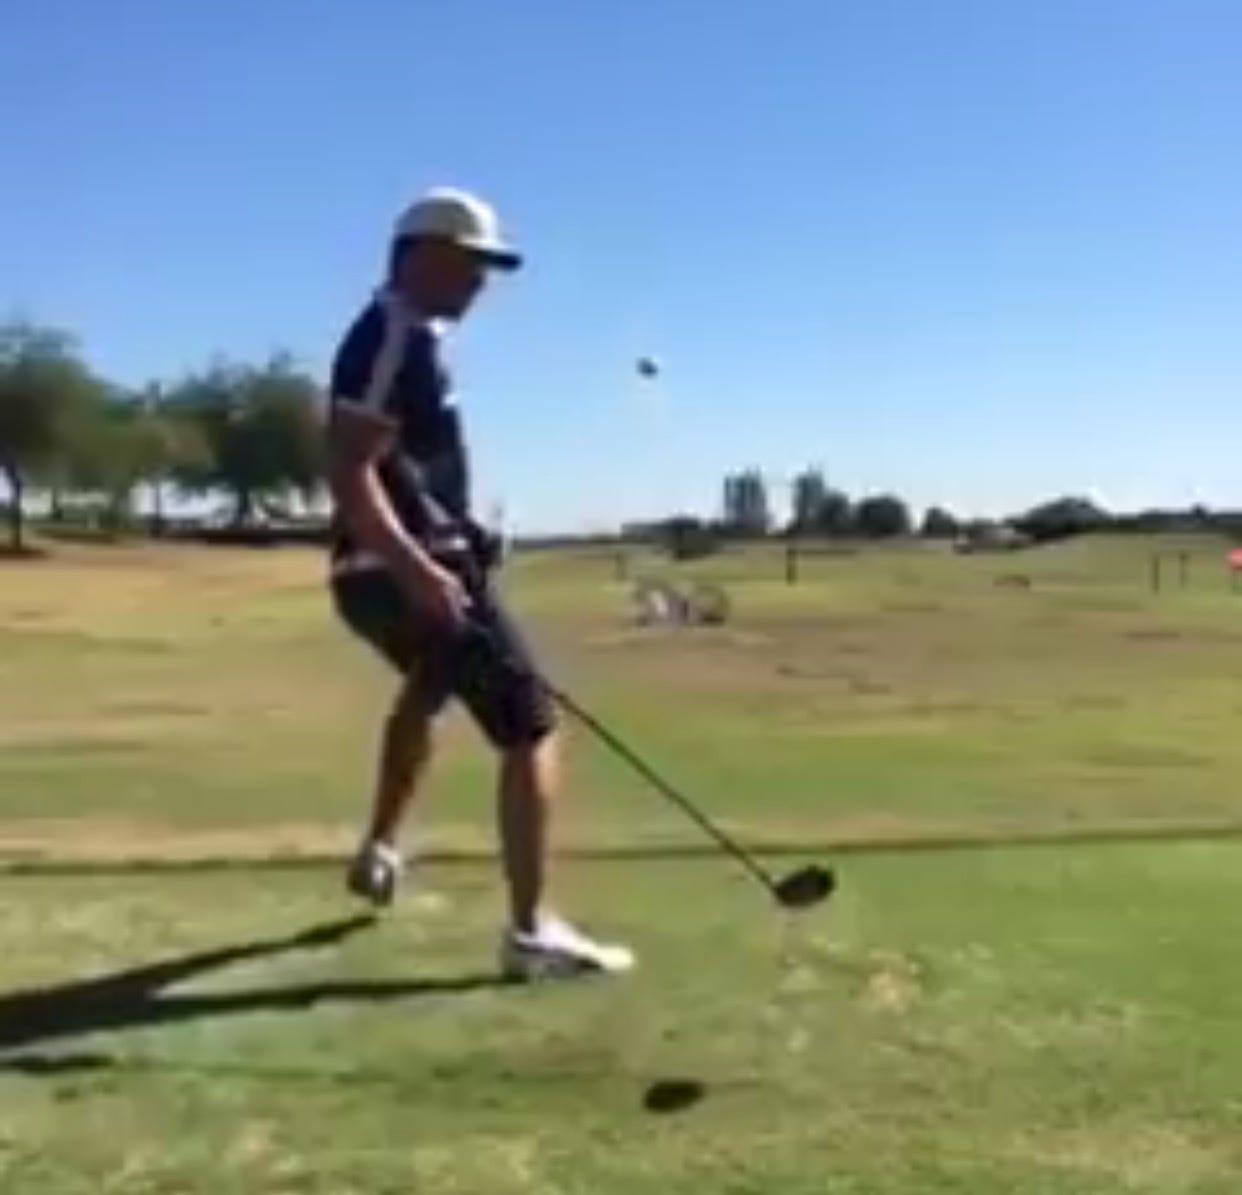 Golf + Soccer = Hardo City